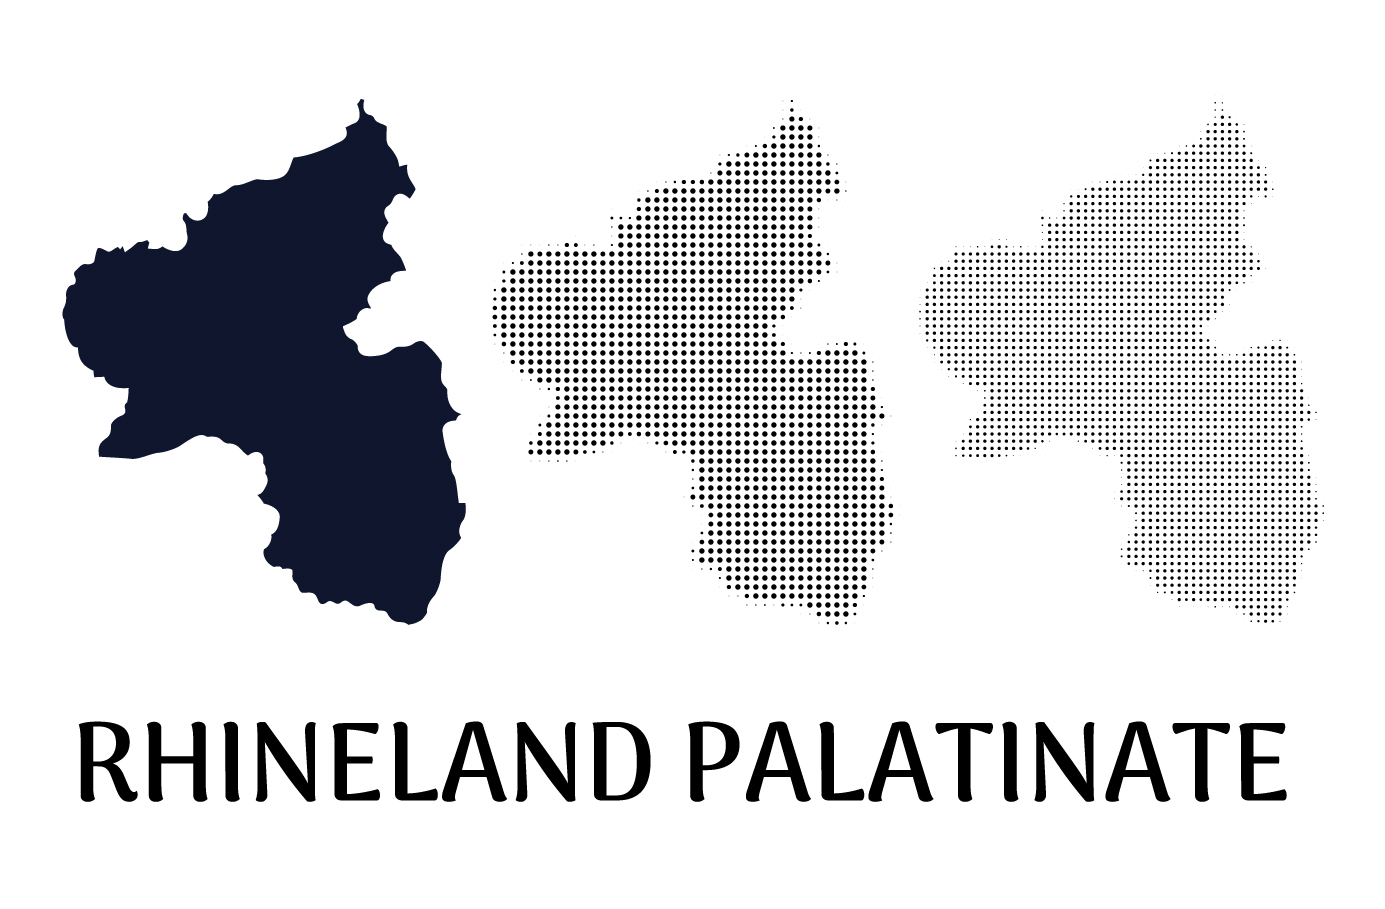 Rhineland Palatinate Germany